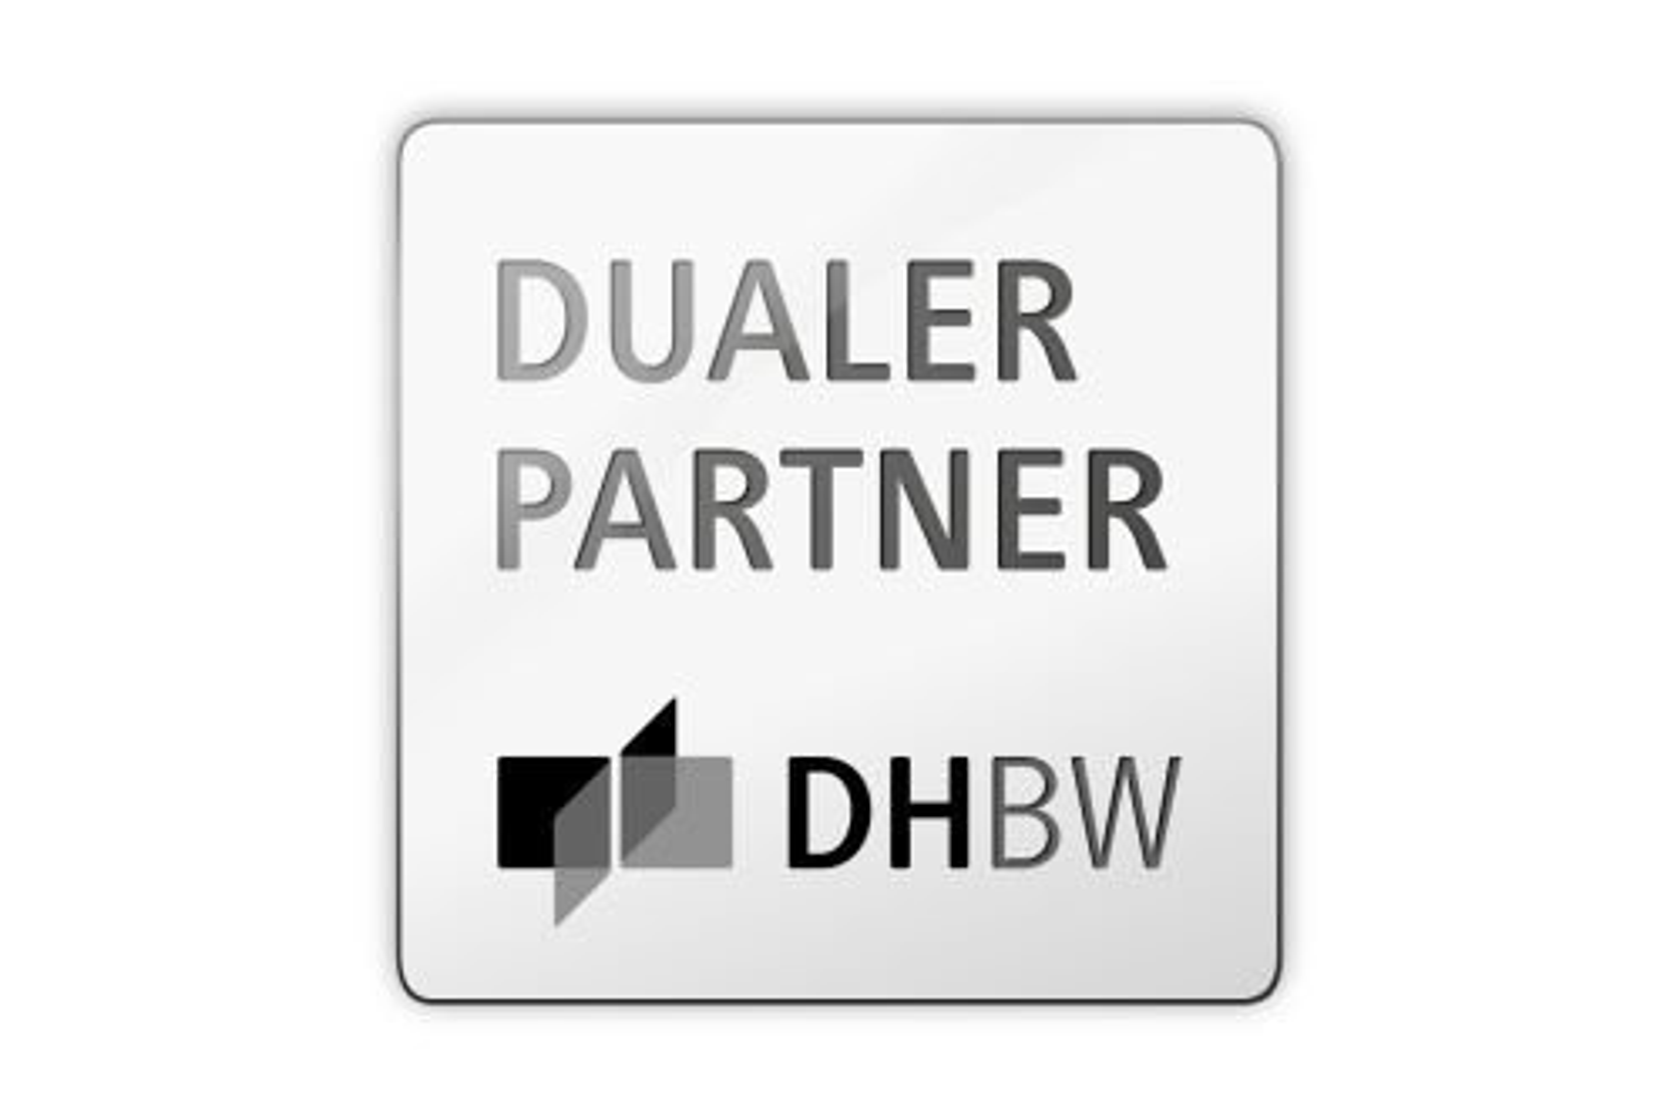 DHBW de Stuttgart